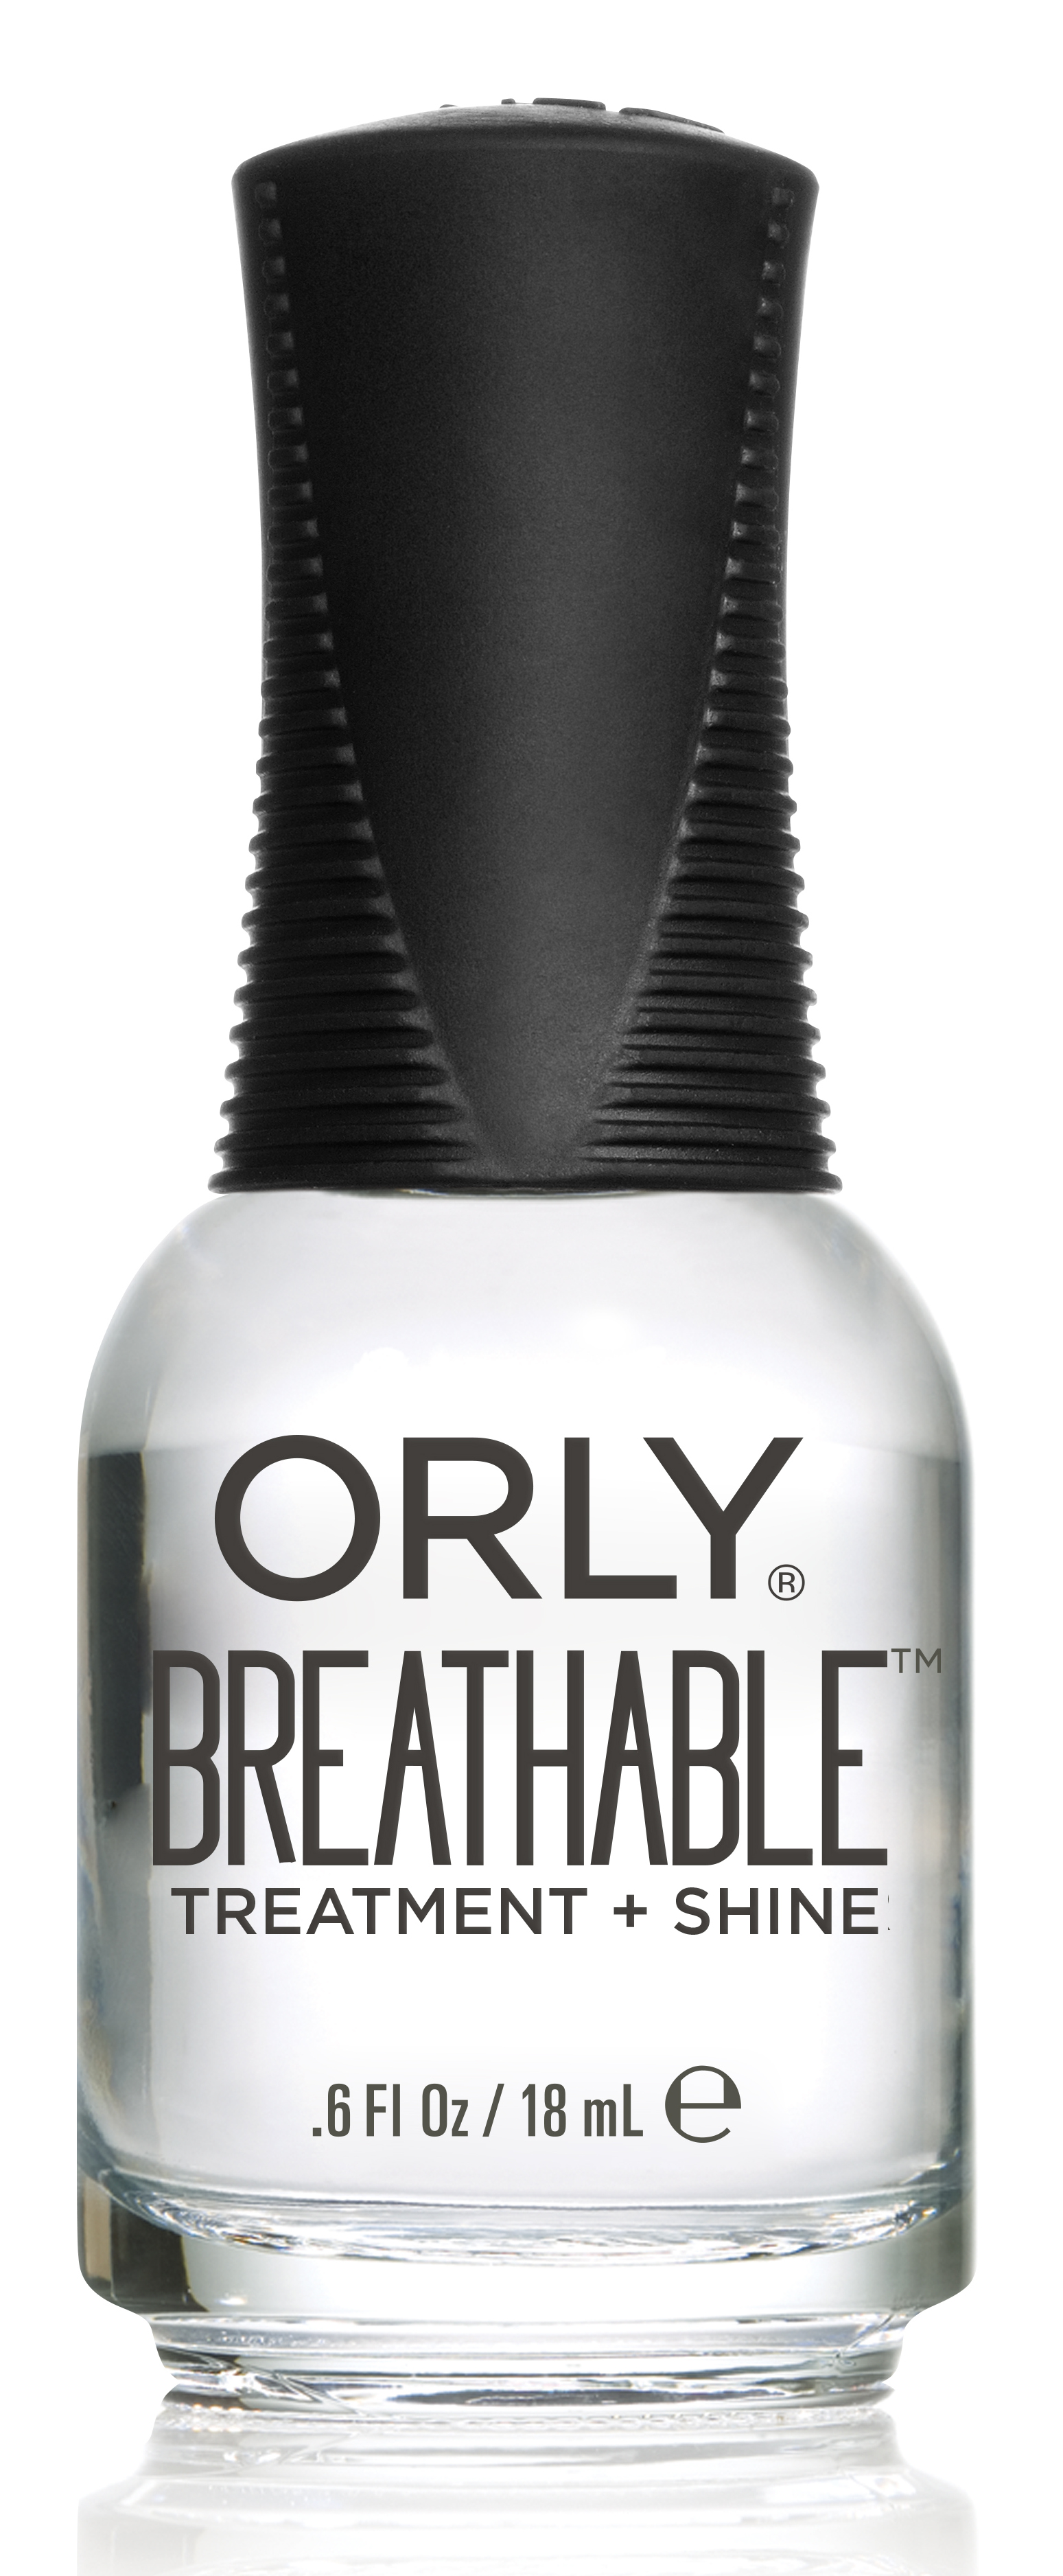 ORLY Уход профессиональный для ногтей / TREATMENT + SHINE BREATHABLE 18 мл - Базовые покрытия